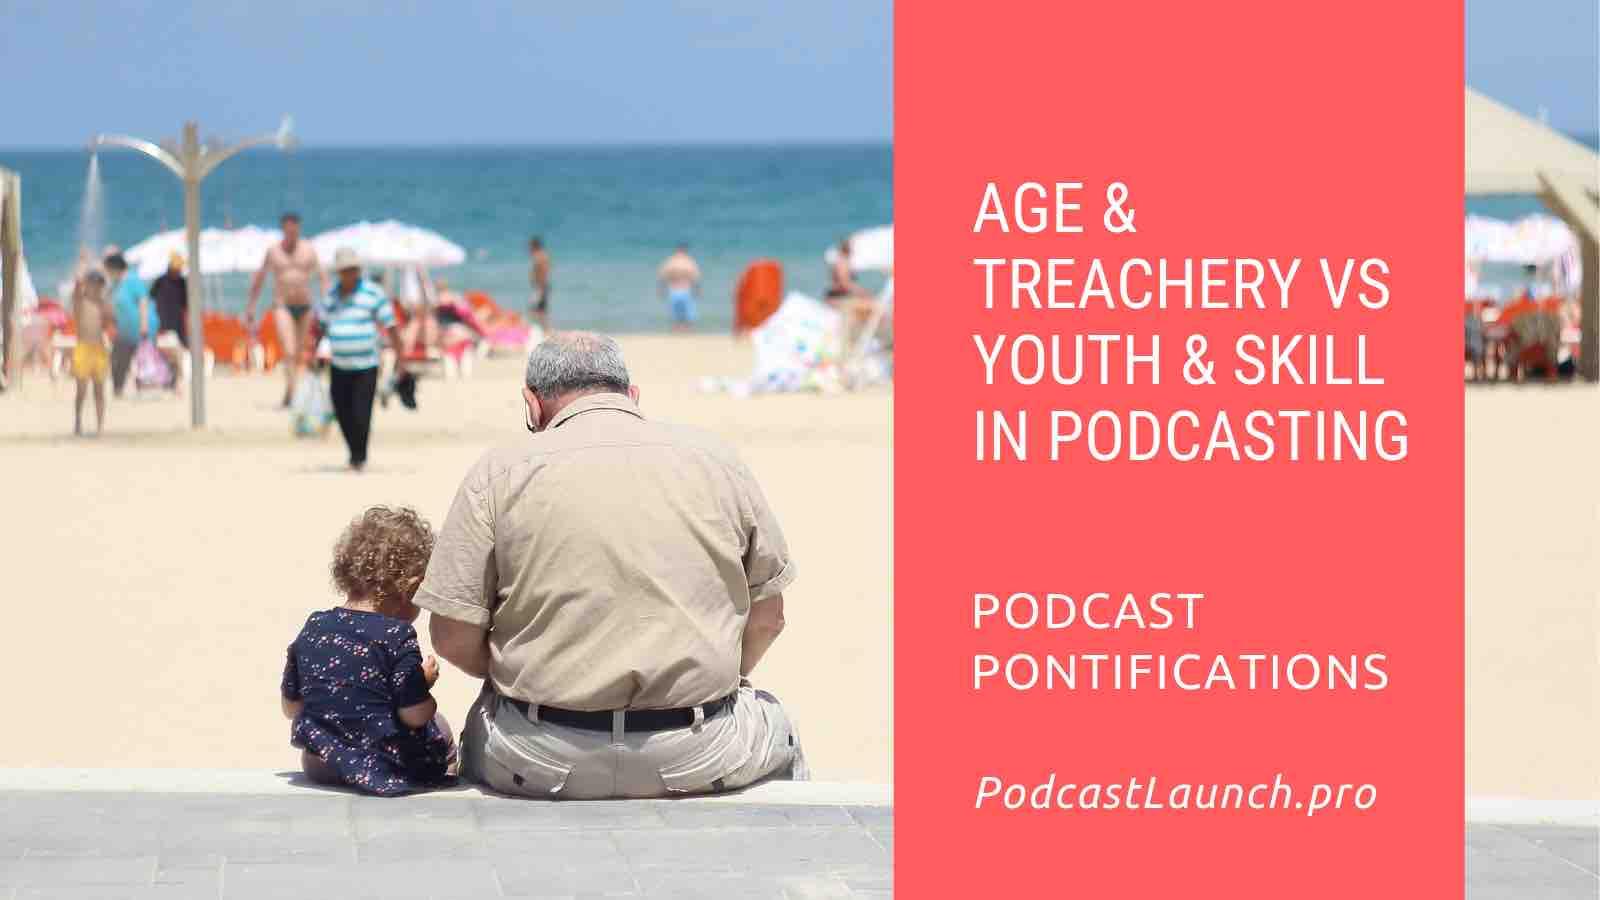 Age & Treachery vs Youth & Skill In Podcasting